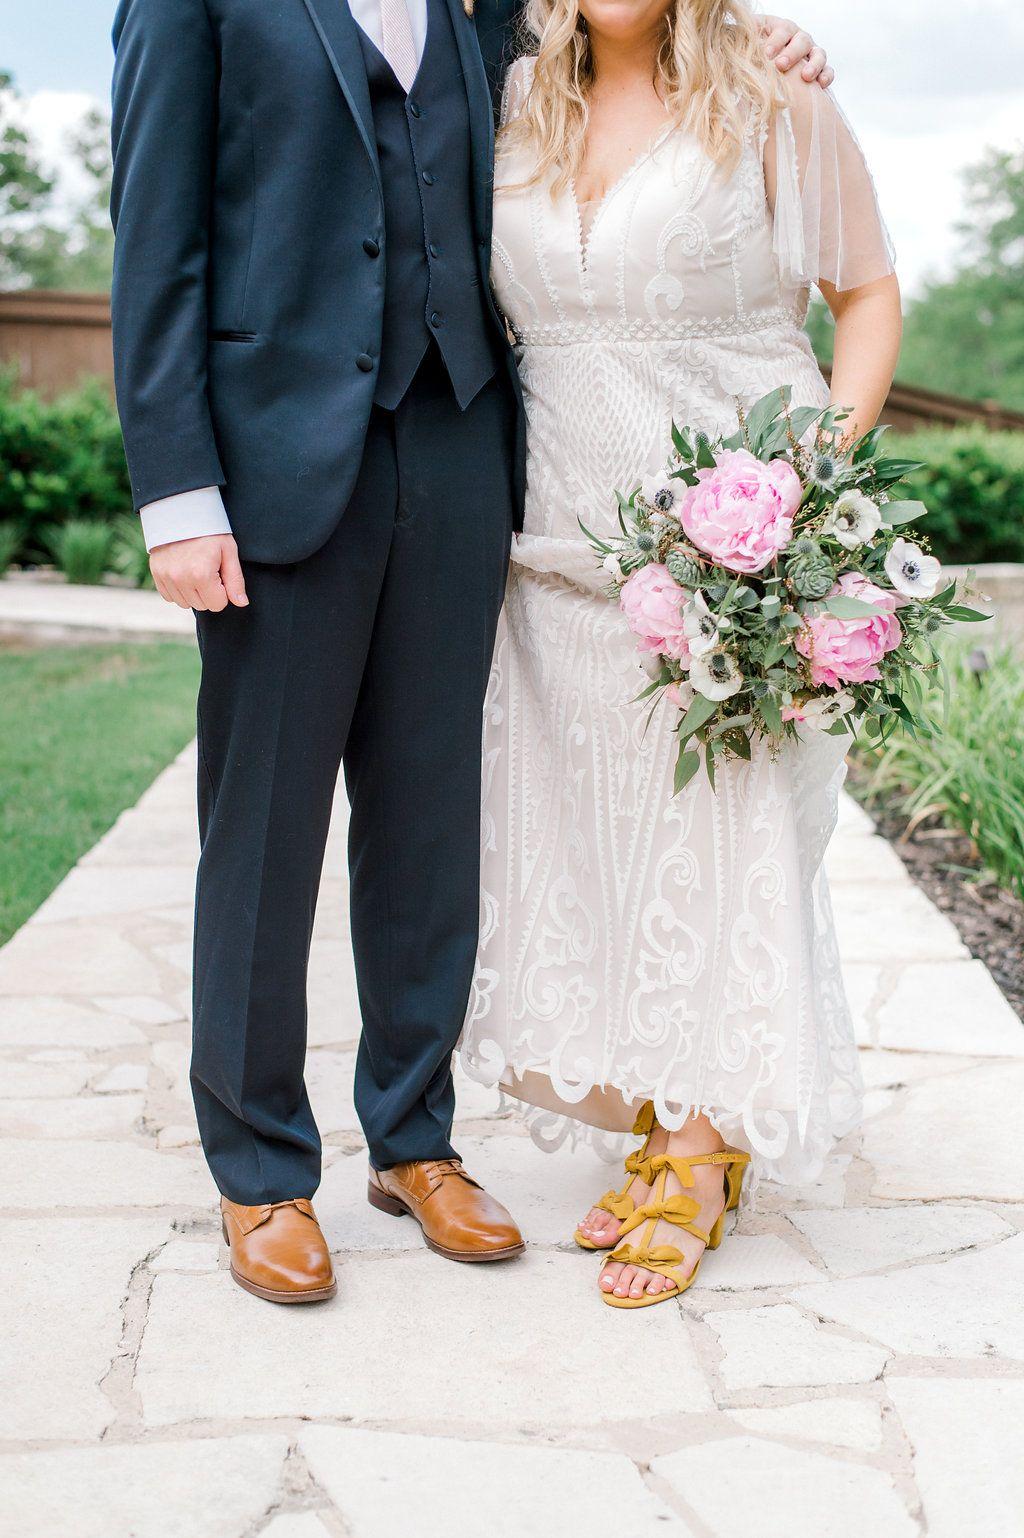 Bohemian bride groom style bohemian wedding style boho bride